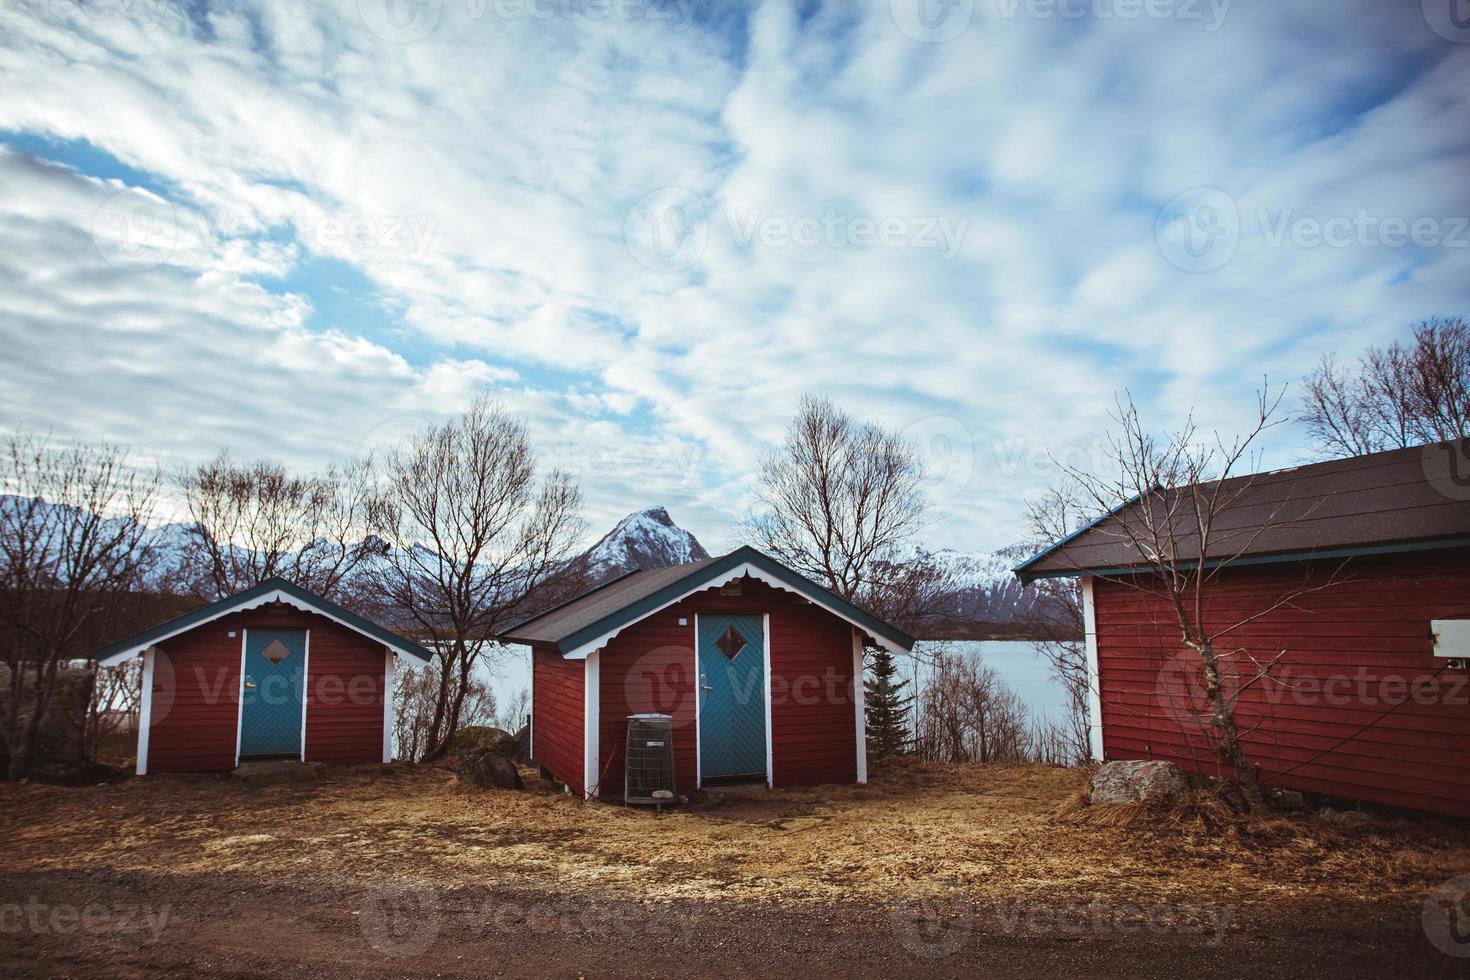 Típica casa roja cerca de la costa del mar en Noruega foto